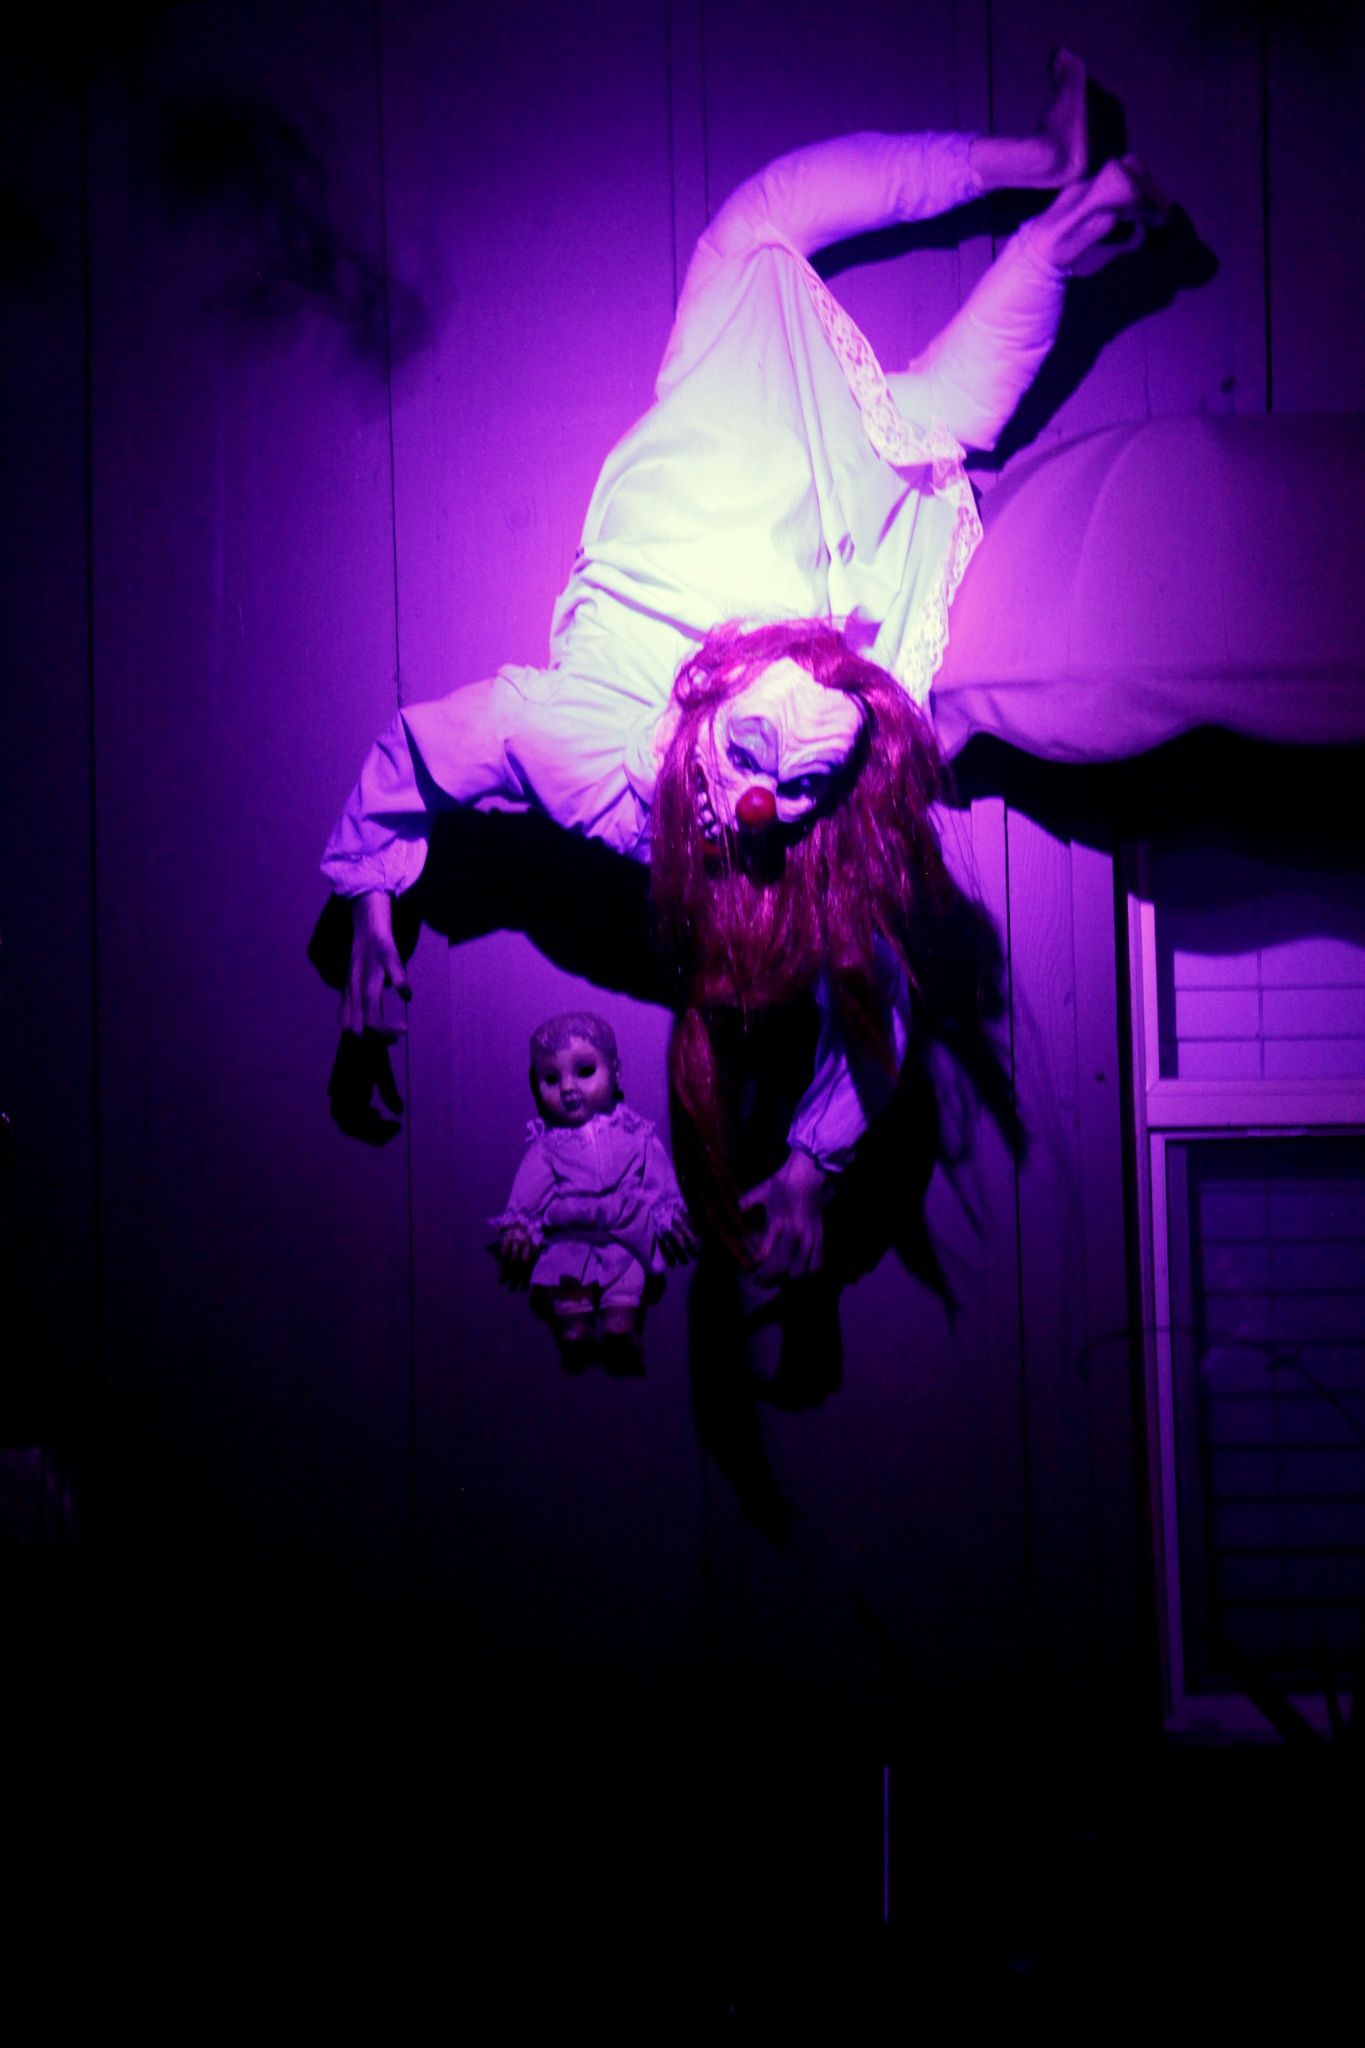 Halloween Corner 6 by Francisco J Chavira